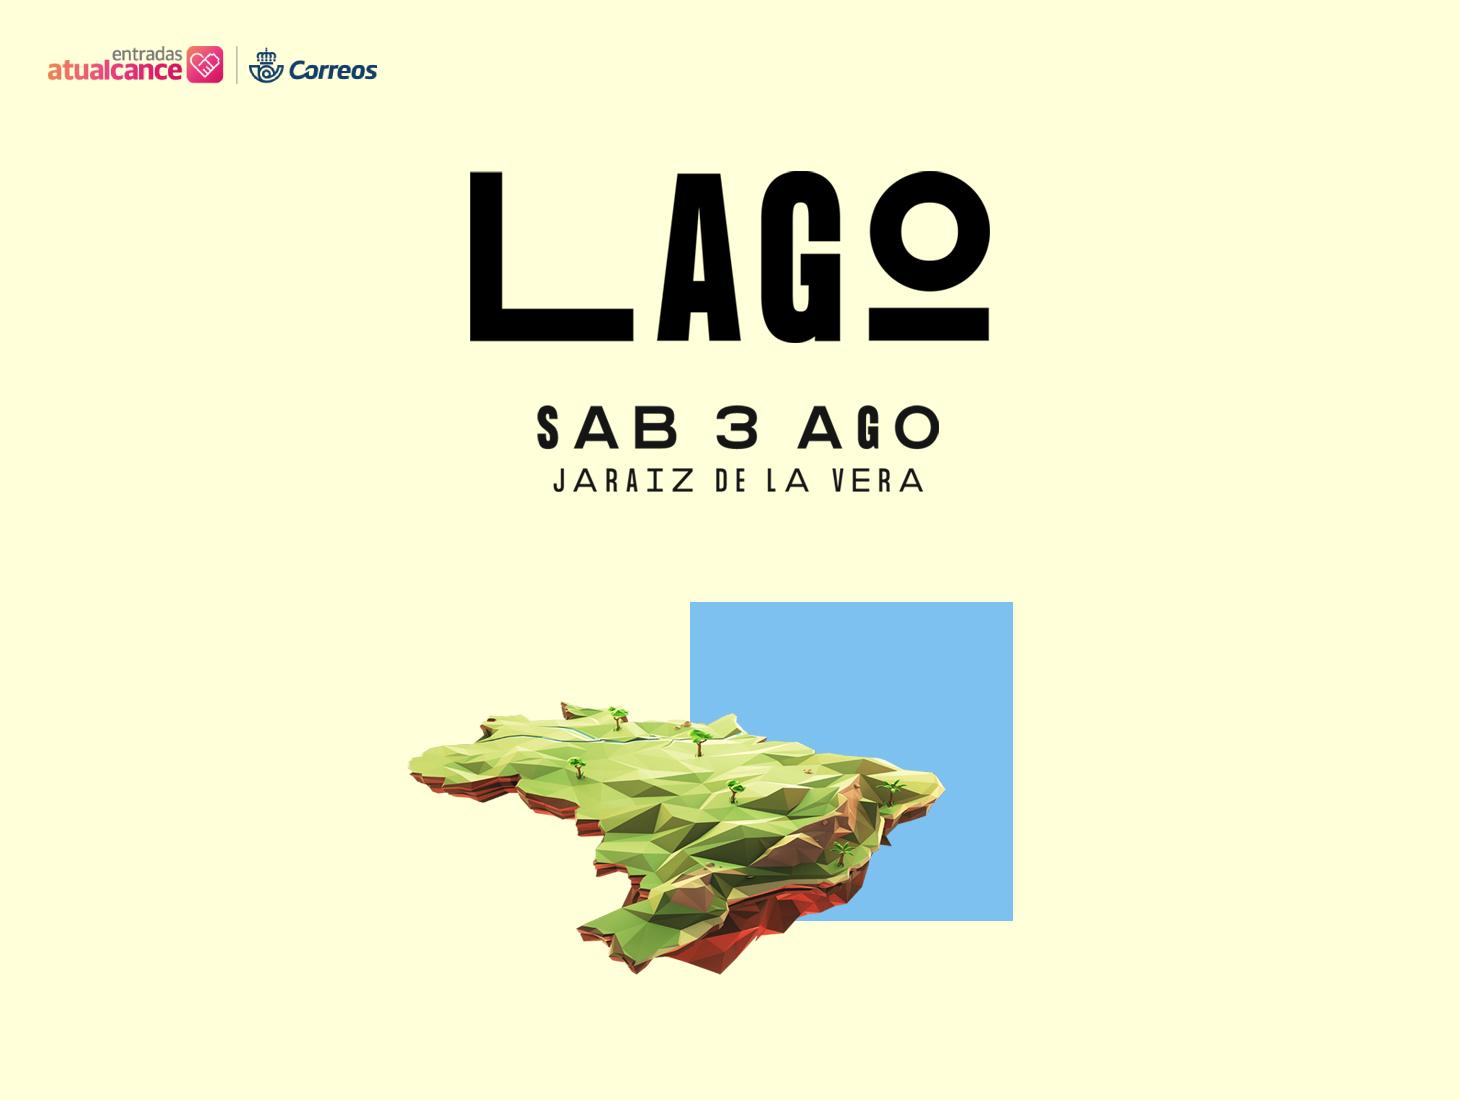 lago-festival-5caf6b40f18d1.jpeg